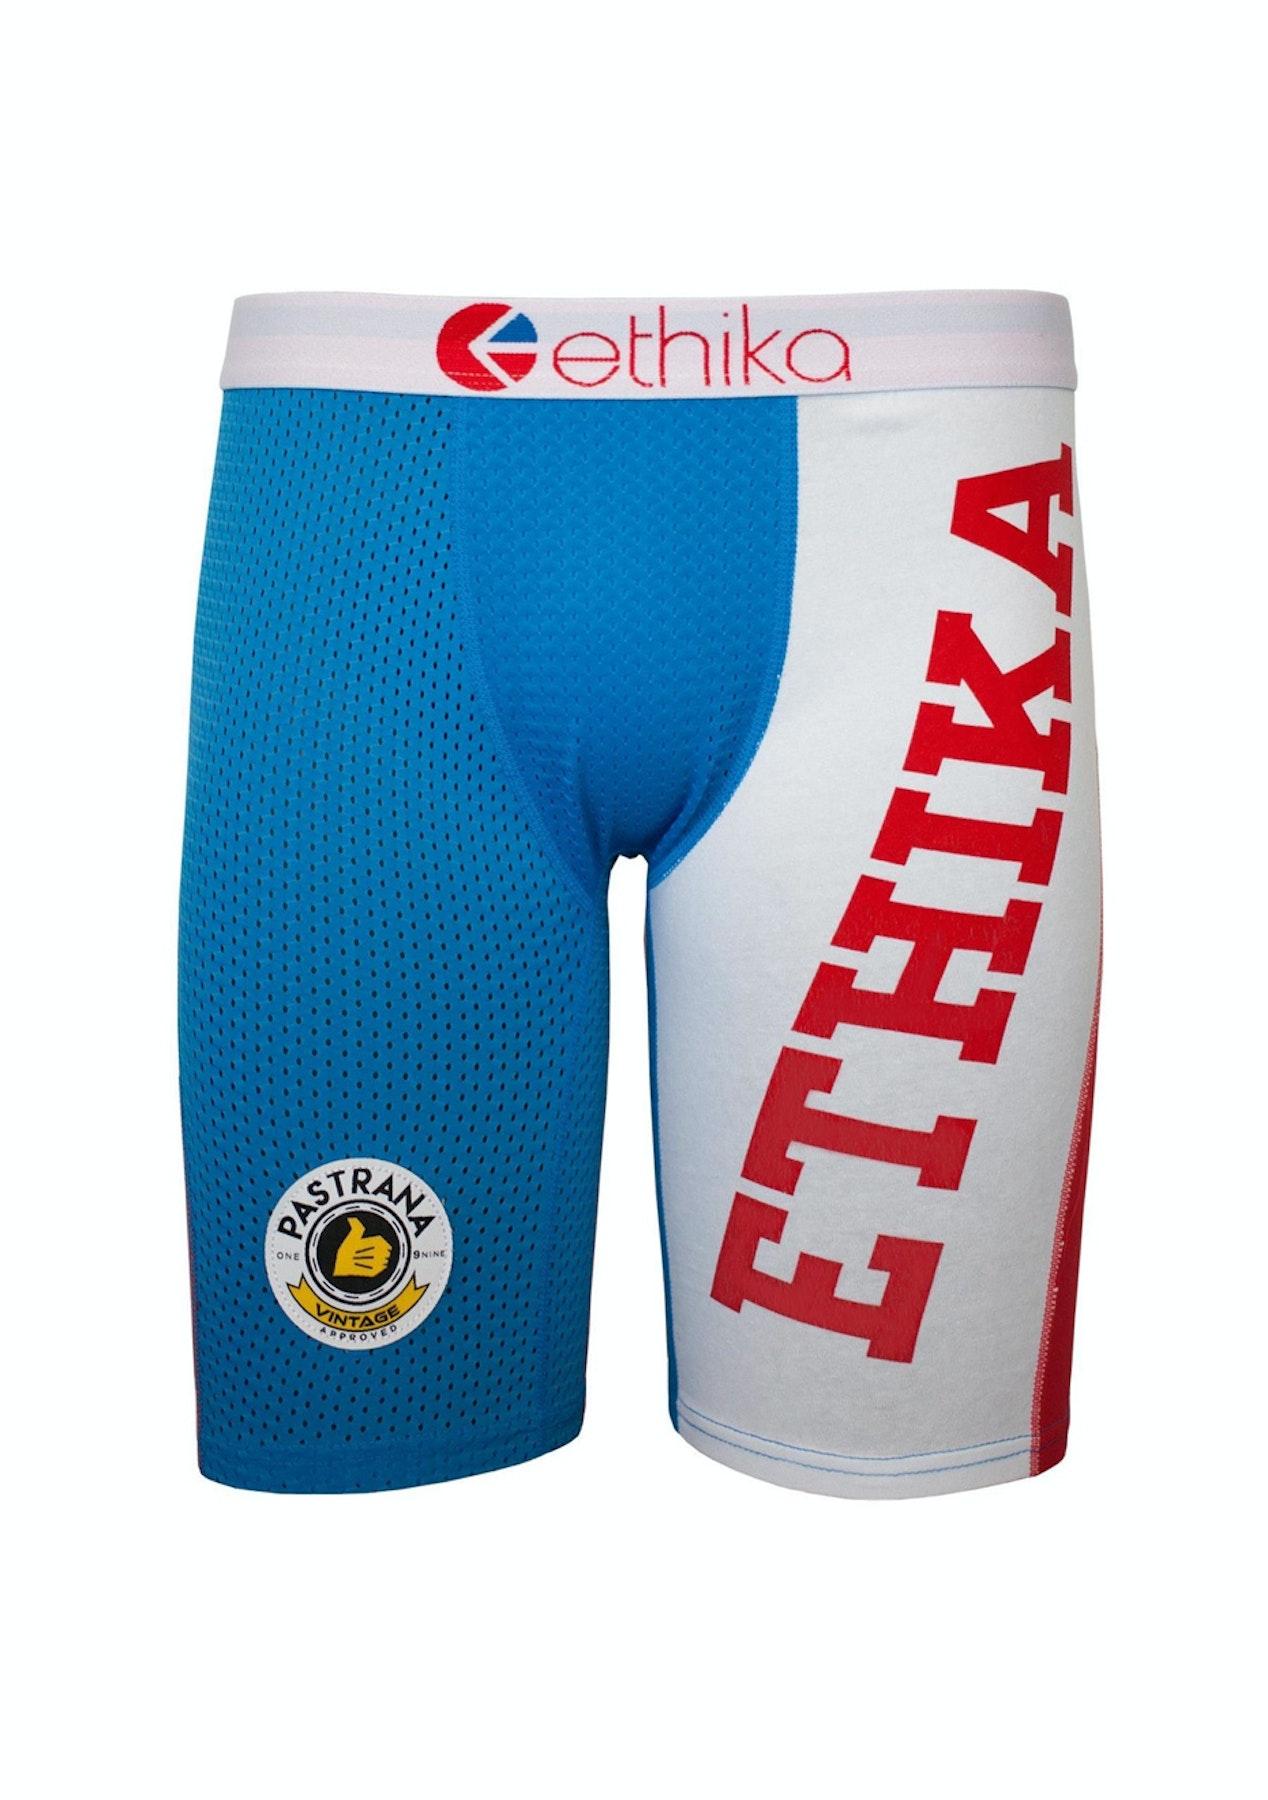 9c59268008 Ethika Mens - Pastrana Vint Tripes Staple - Free Shipping Ethika Underwear  up to 55% off - Onceit